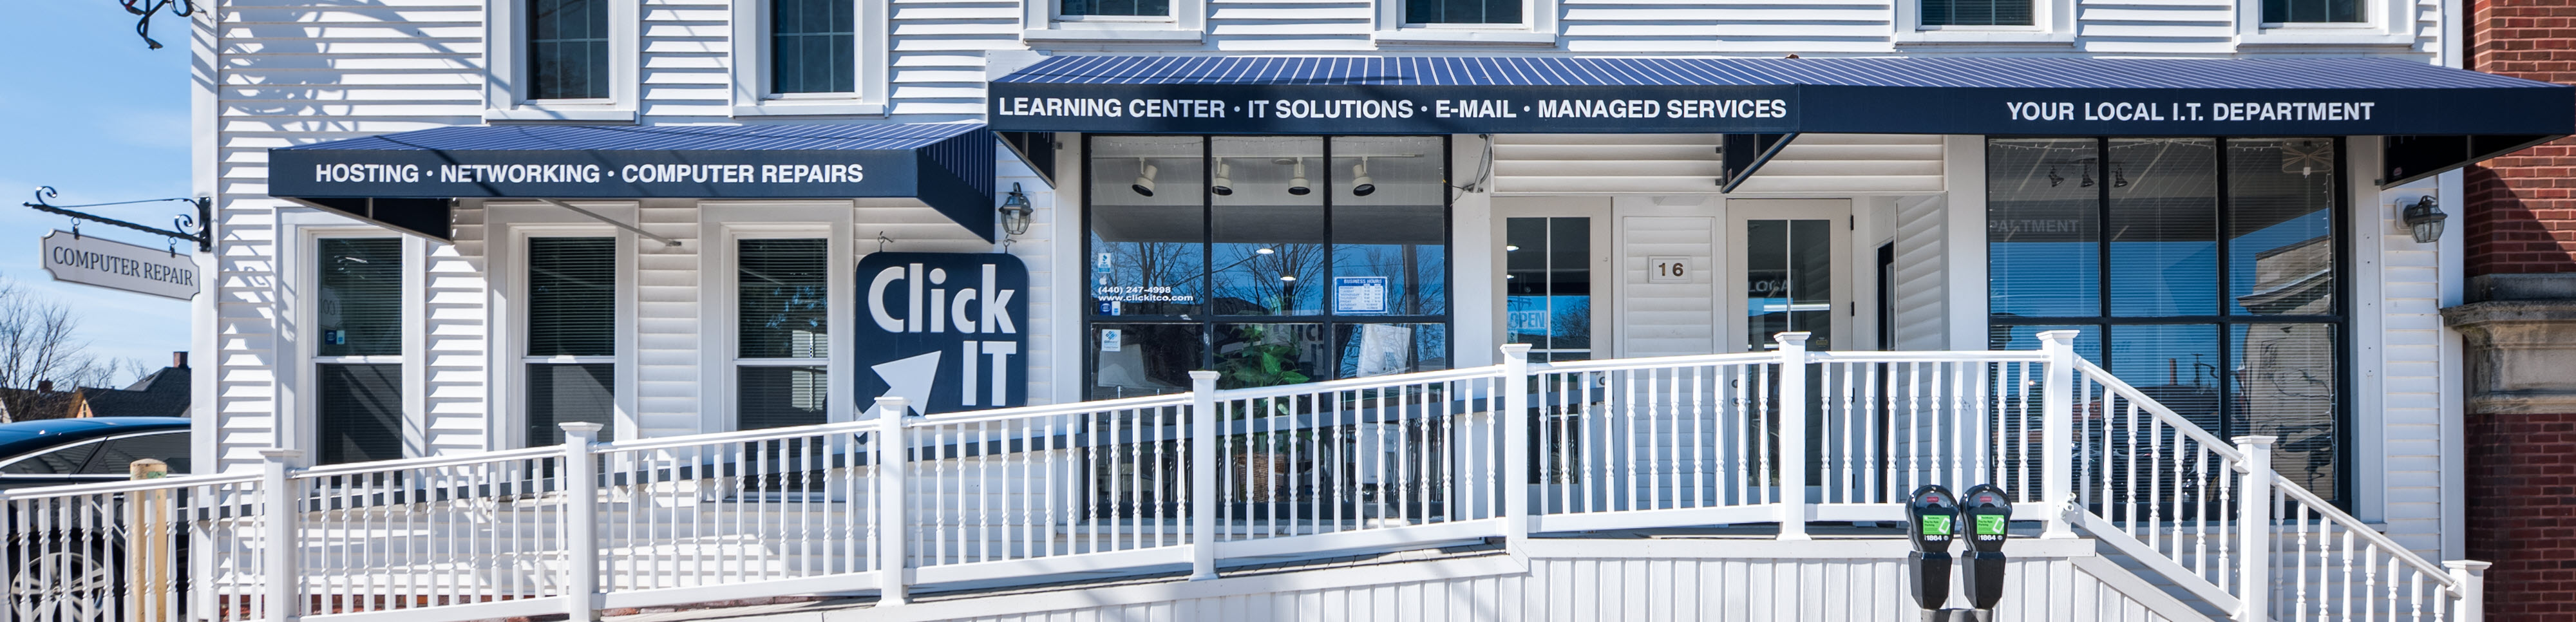 Click IT Company Store in Chagrin Falls Ohio